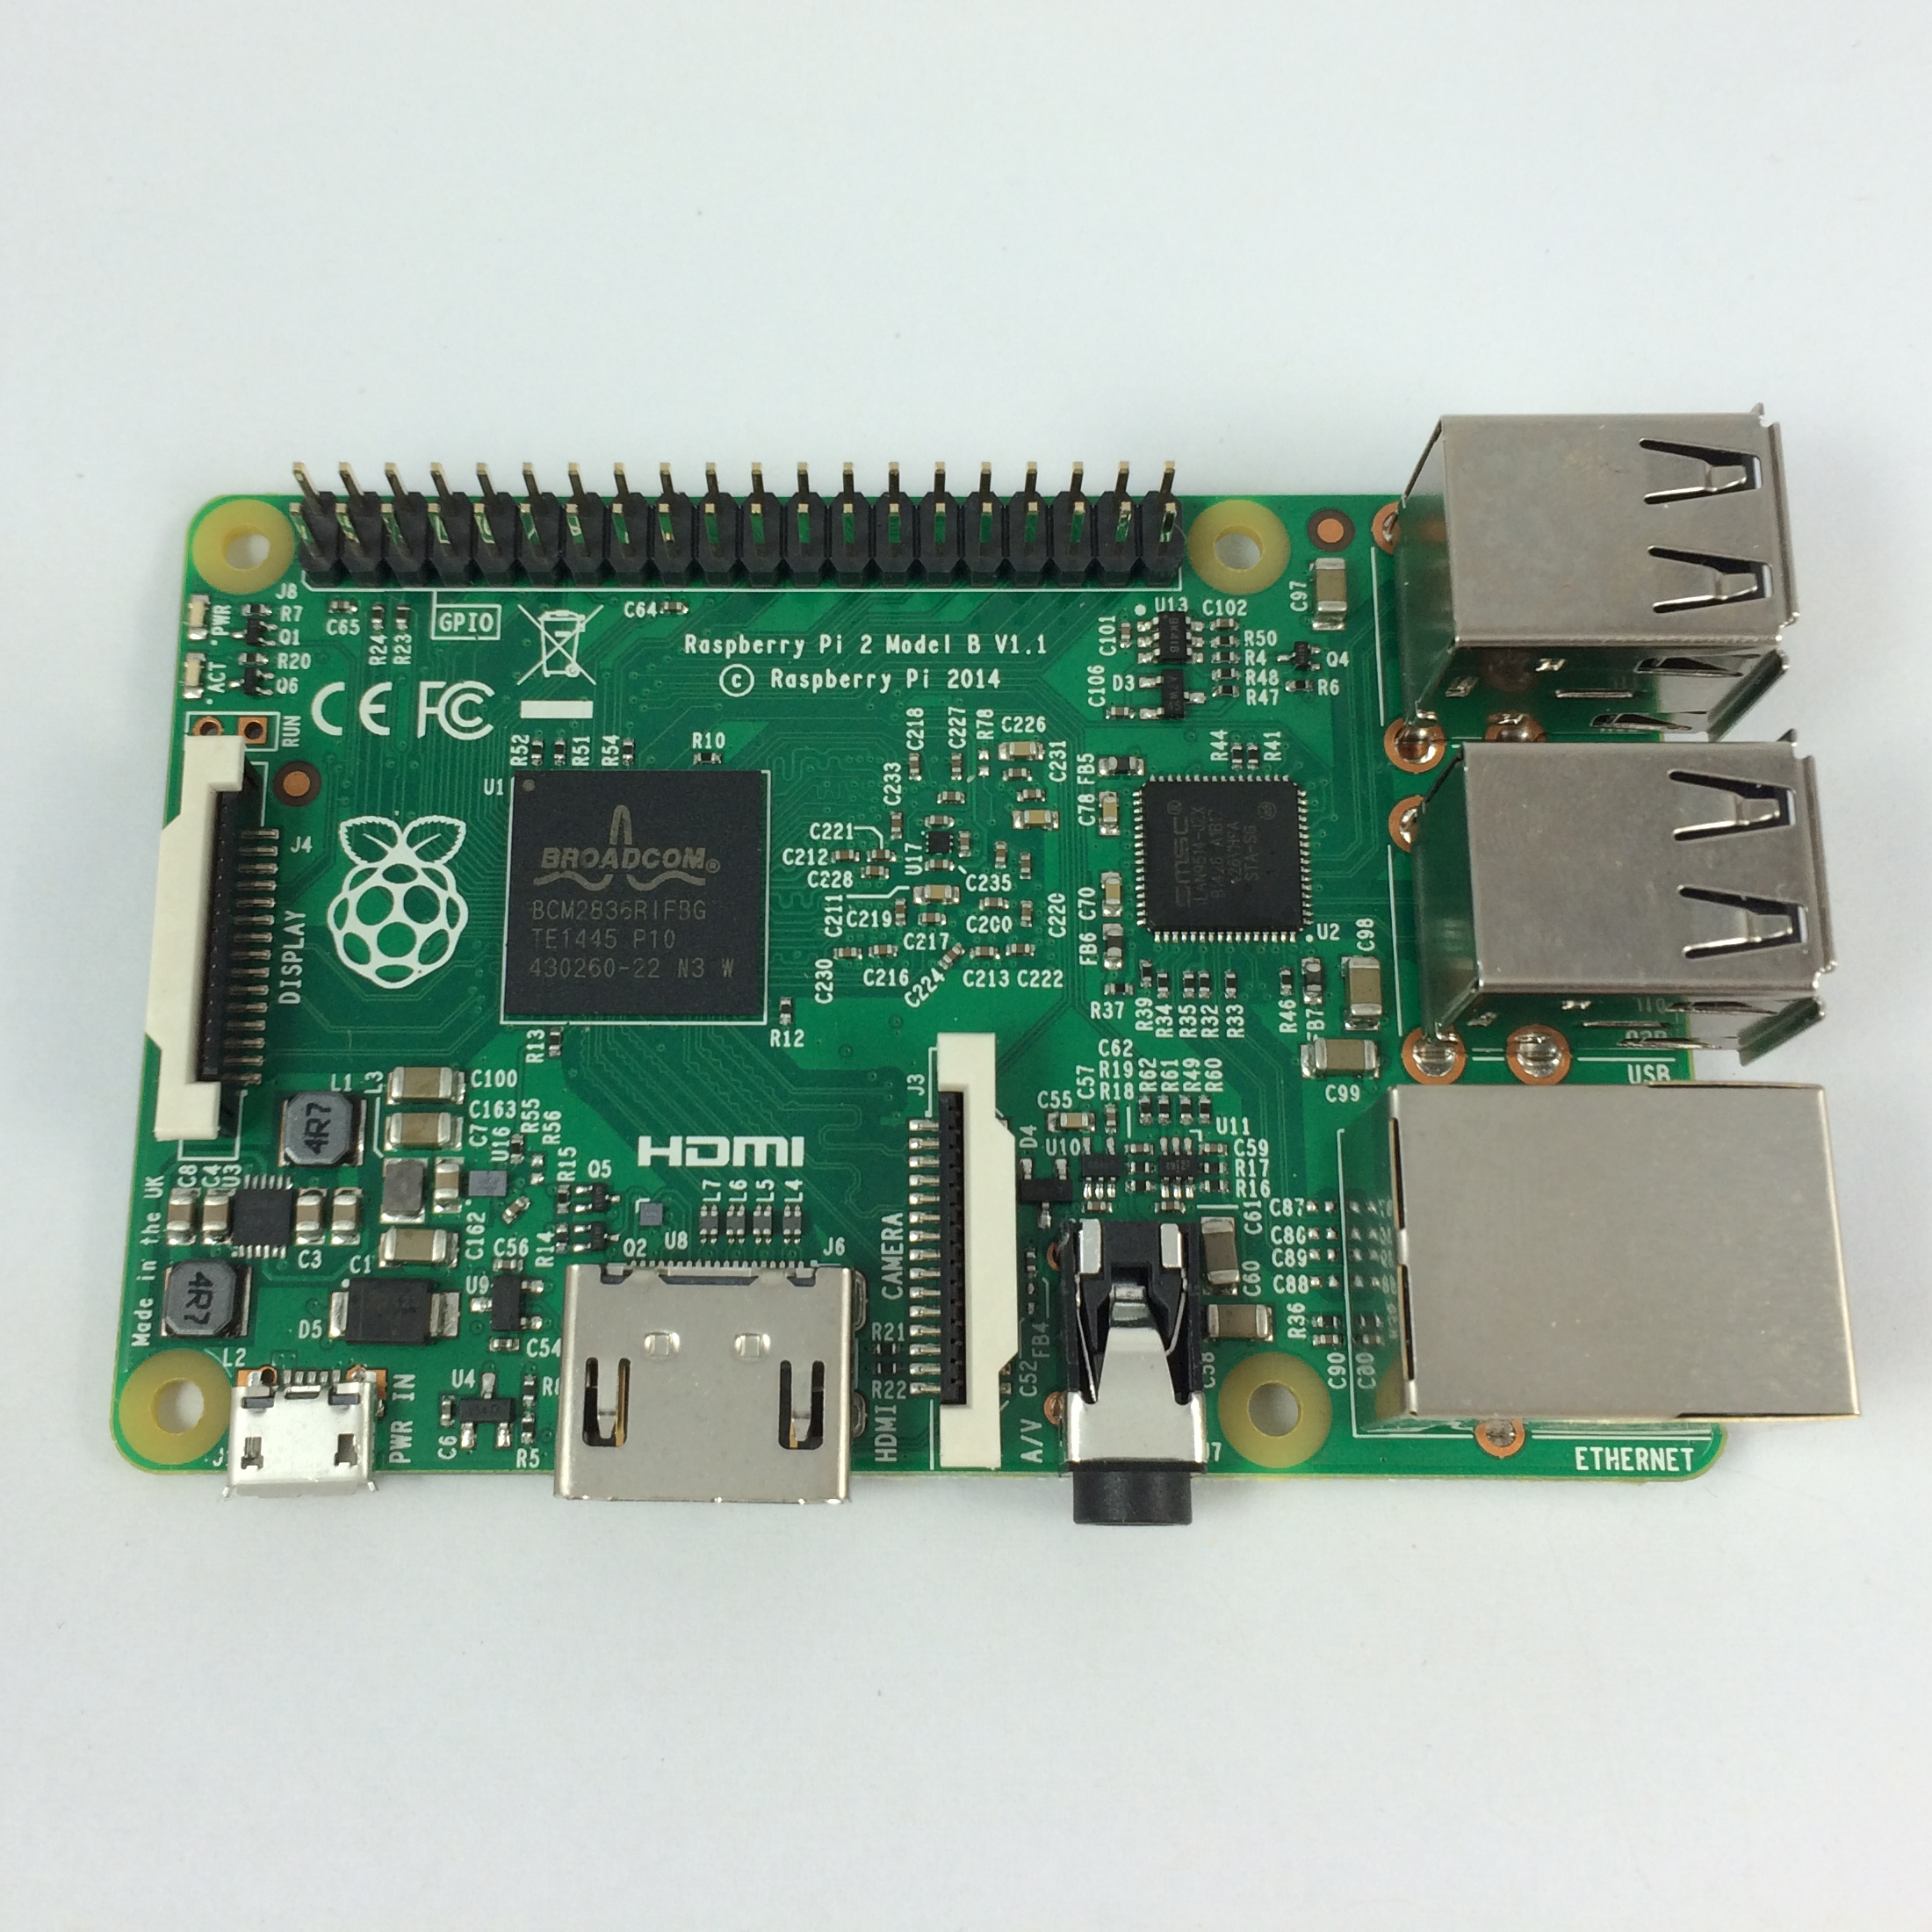 The Raspberry Pi 2, Model B